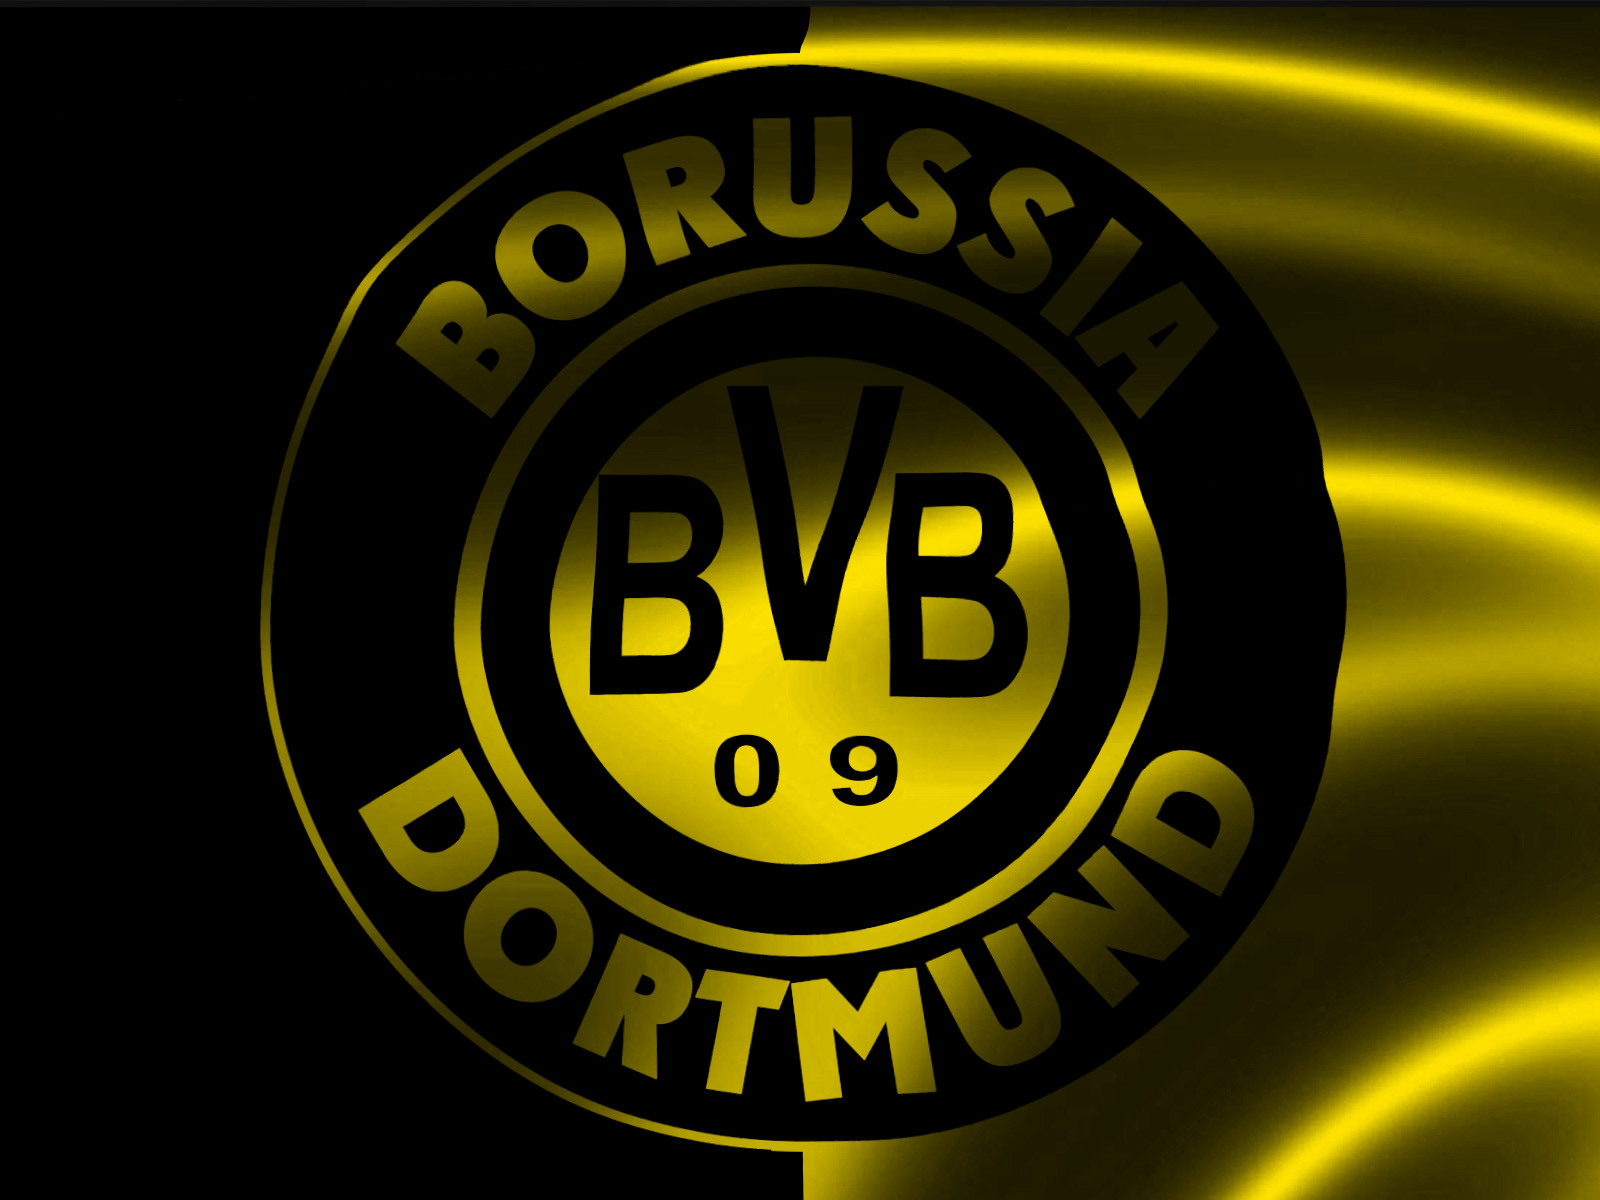 Winterpauschalen Pension furthermore Borussia Dortmund Tempted 60m Bid Arsenal Target Pierre Emerick Aubameyang Not Want Sell also Bvb09 moreover Bvb09 also Los Renglones Torcidos De Pep. on sport card bo